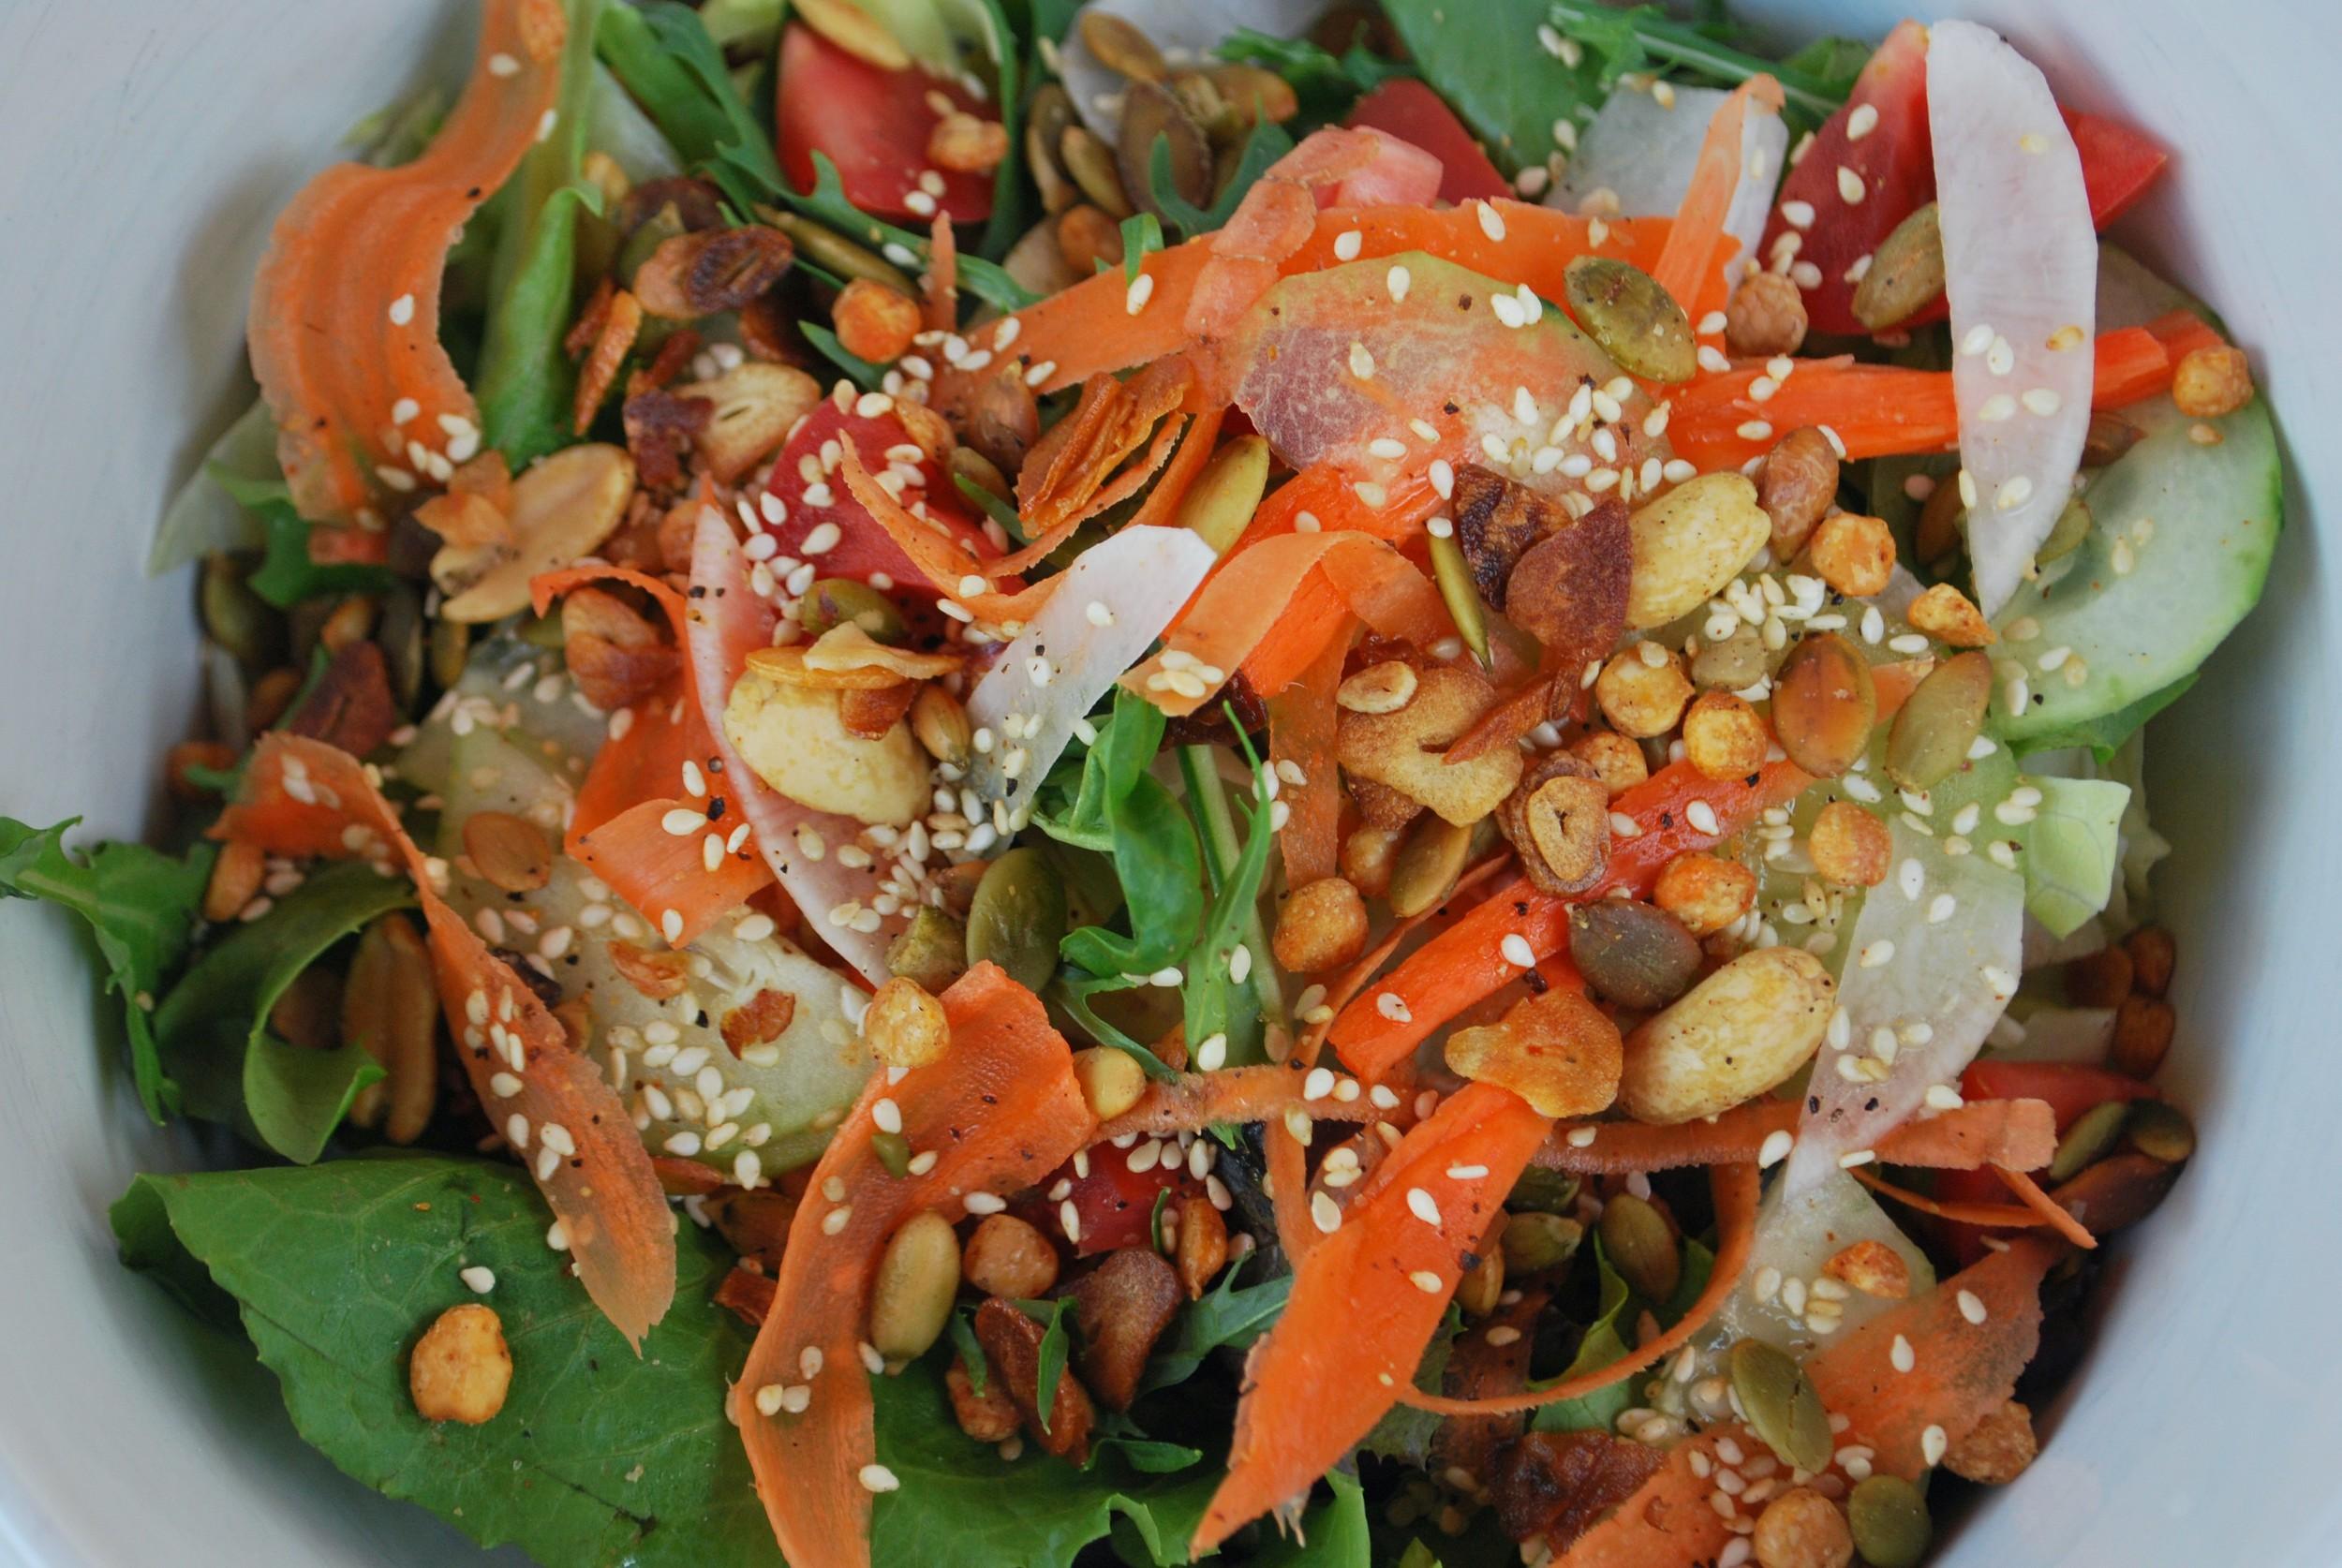 MASALA SUMMER SALAD - Healthy salad with Indian trail mix